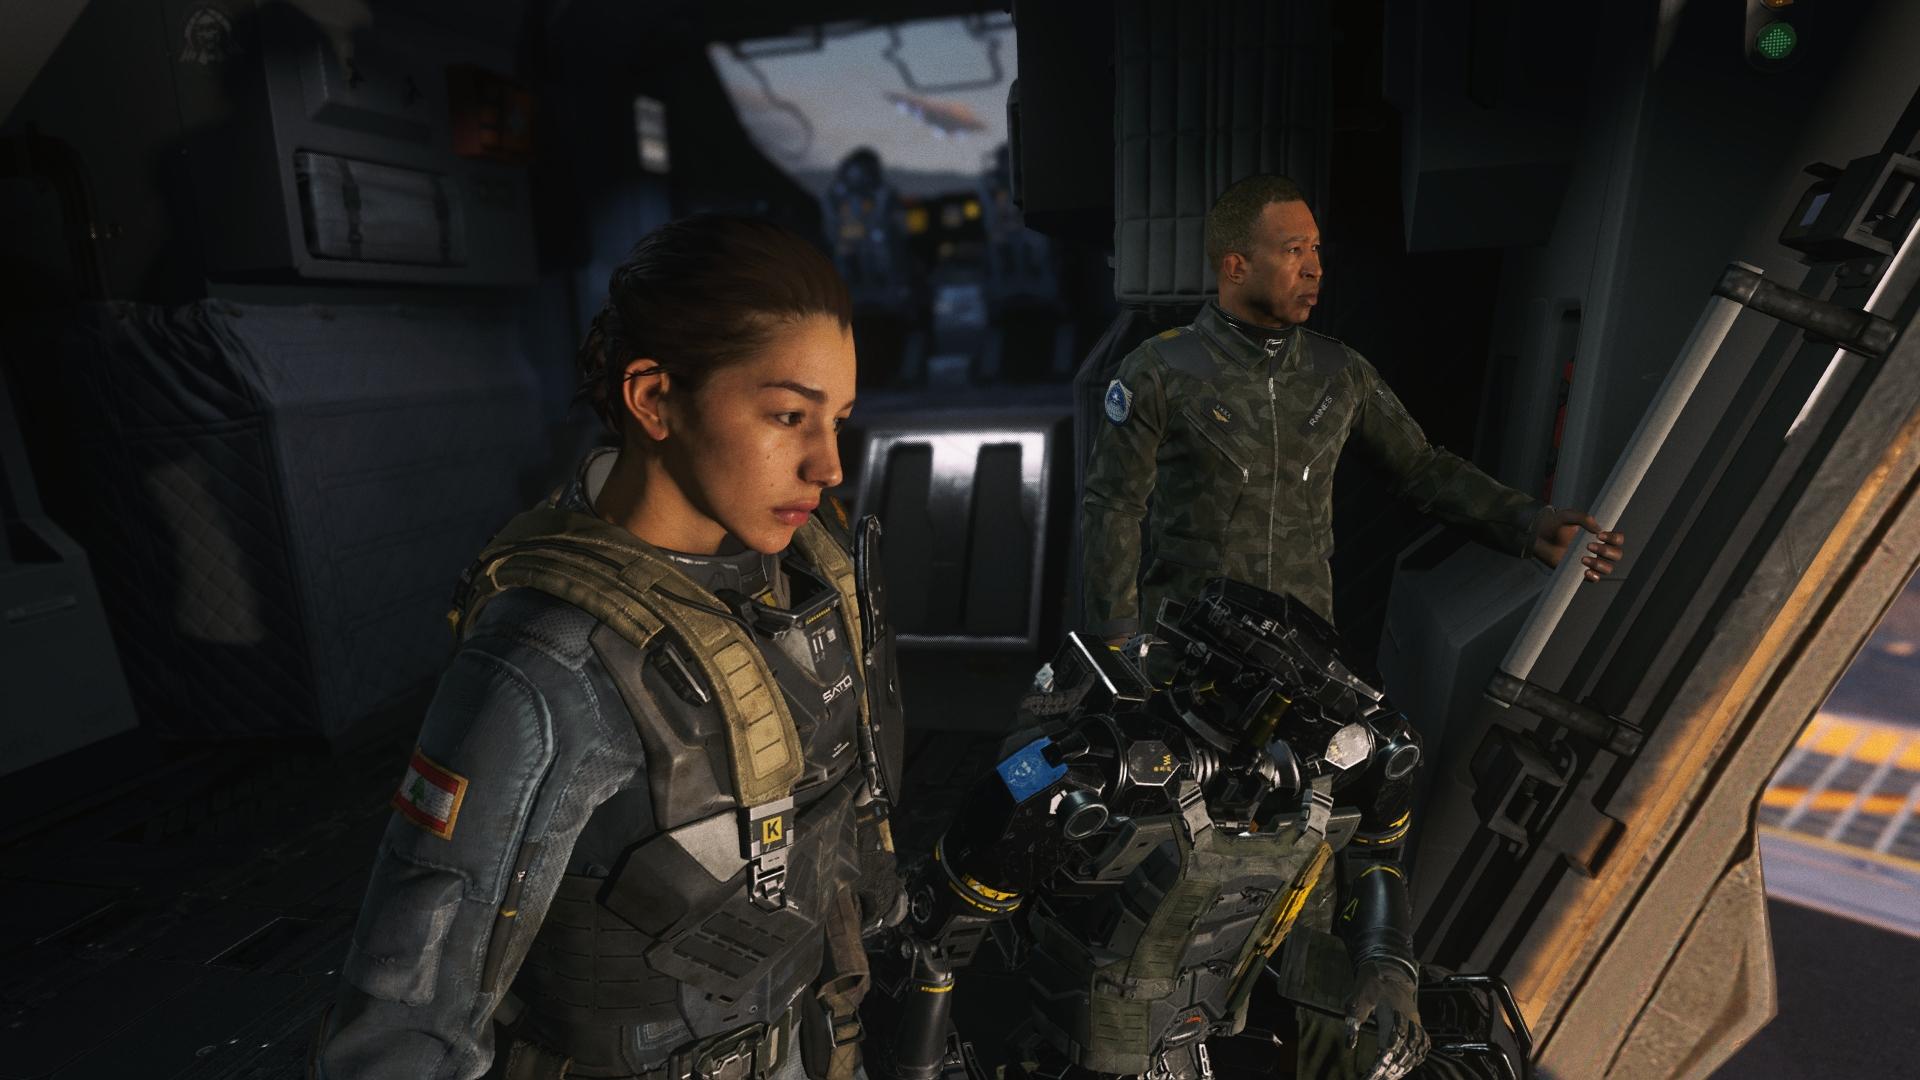 00016.Jpg - Call of Duty: Infinite Warfare